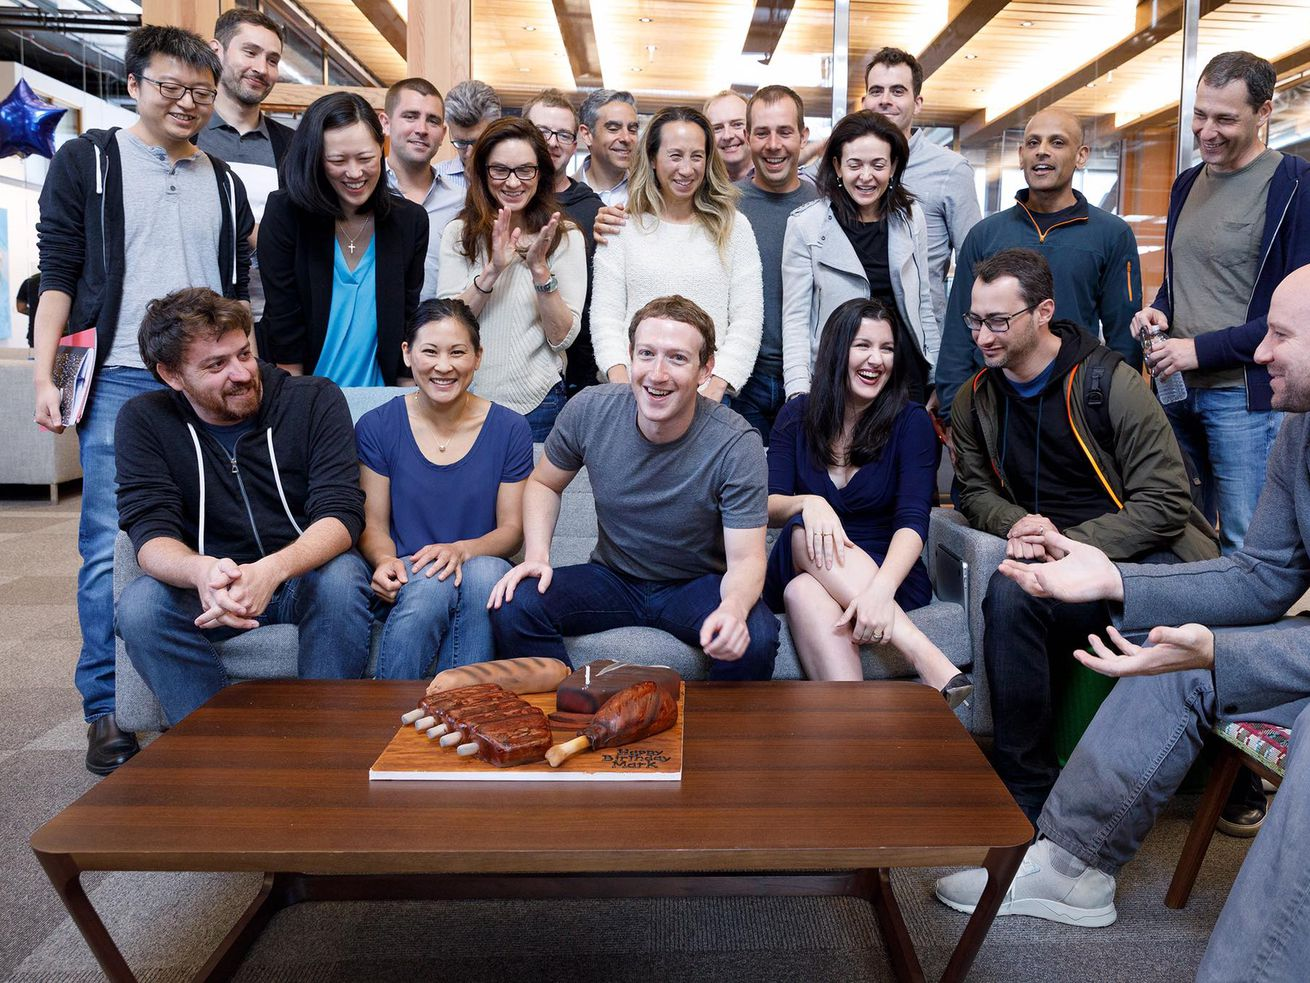 Facebook's top execs 'make tobacco executives look like Mr. Rogers'